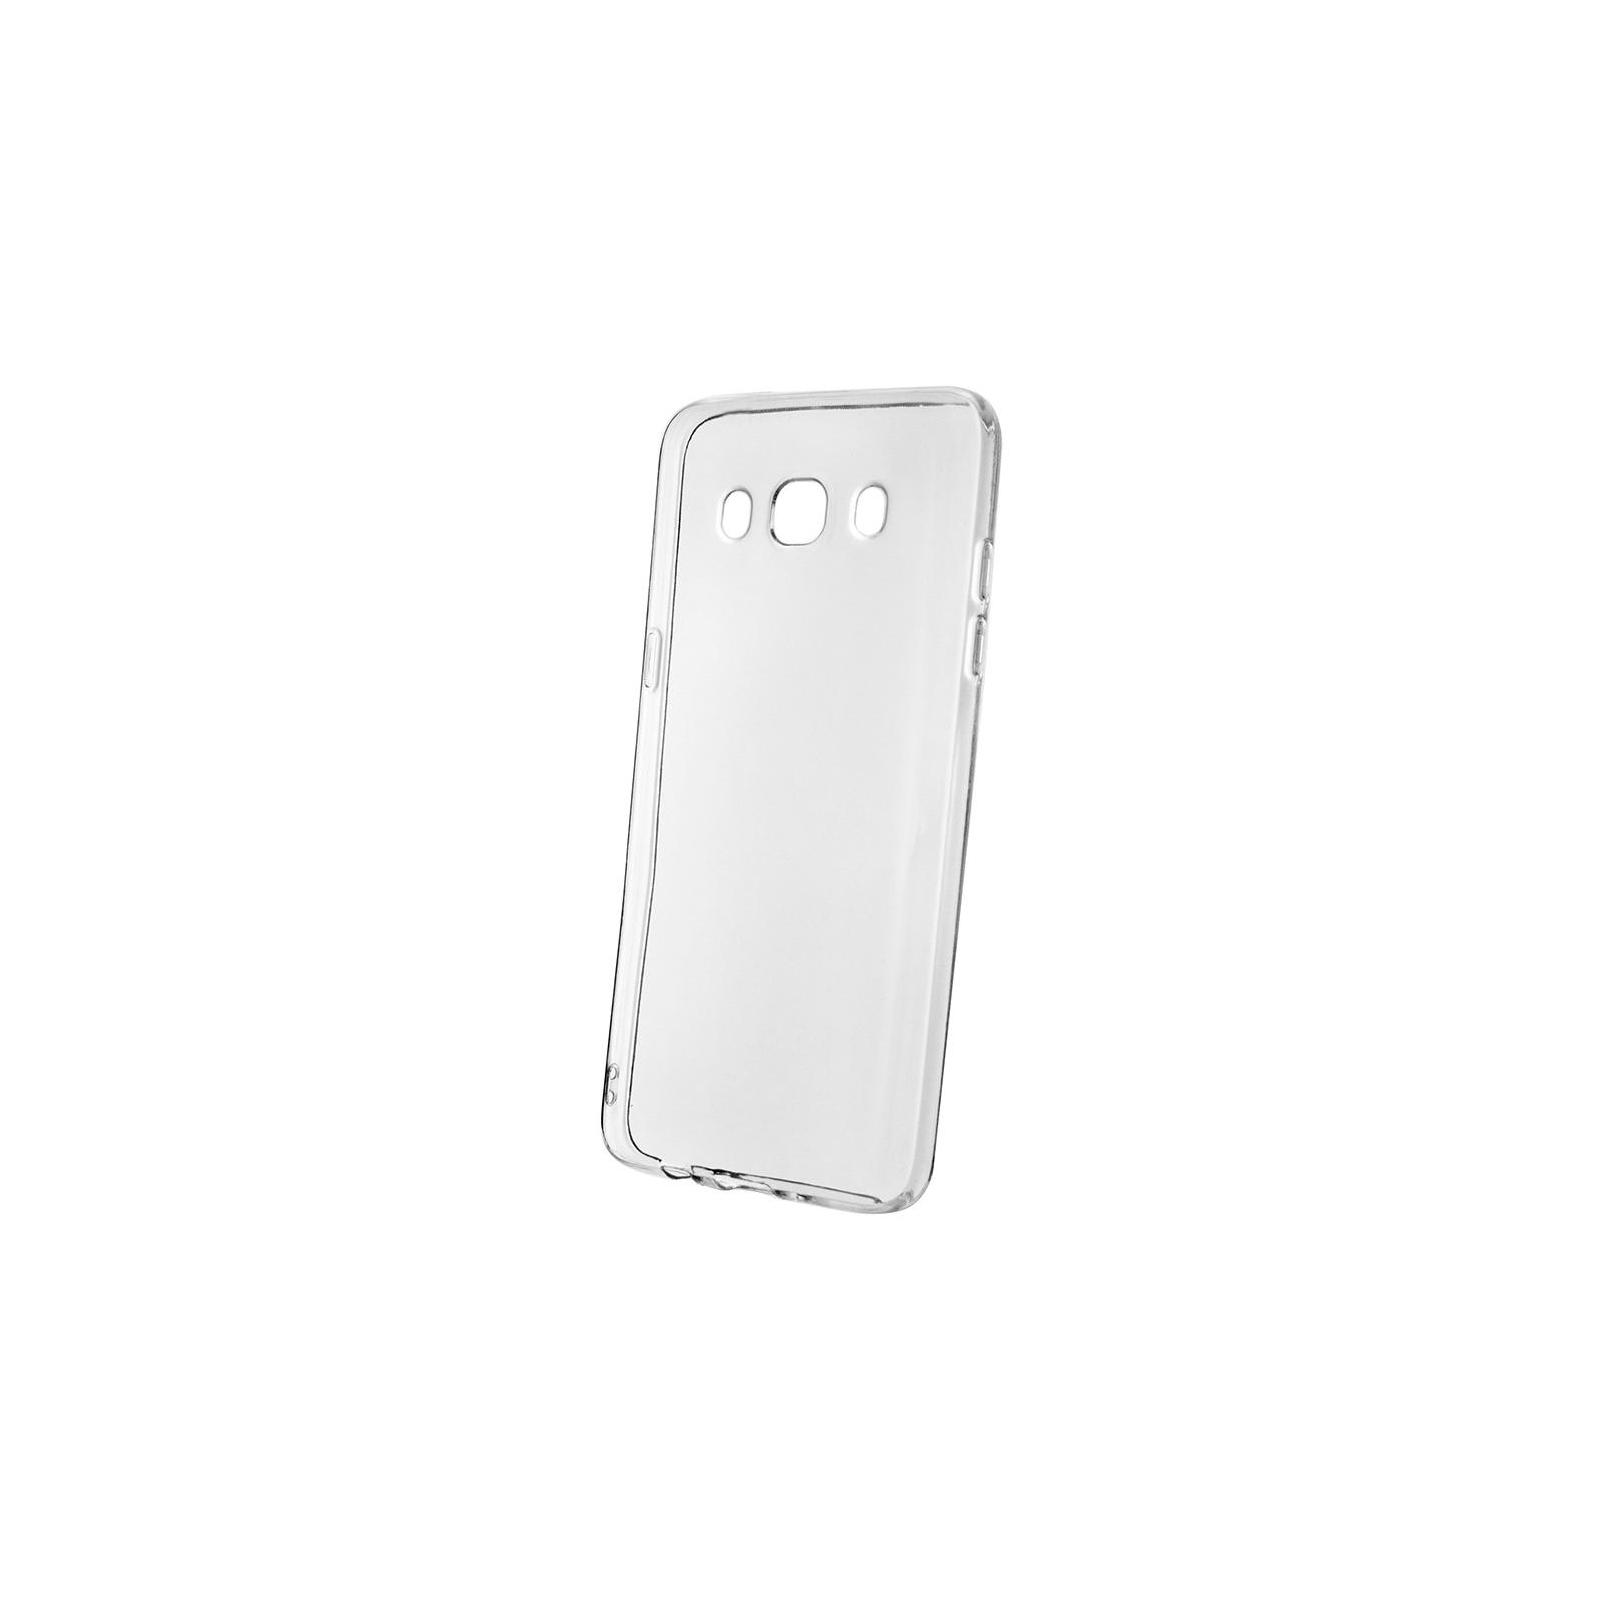 Чехол для моб. телефона Colorway ultrathin TPU case for Samsung Galaxy J5 (2016) SM-J510 (CW-CTPSJ510) изображение 2